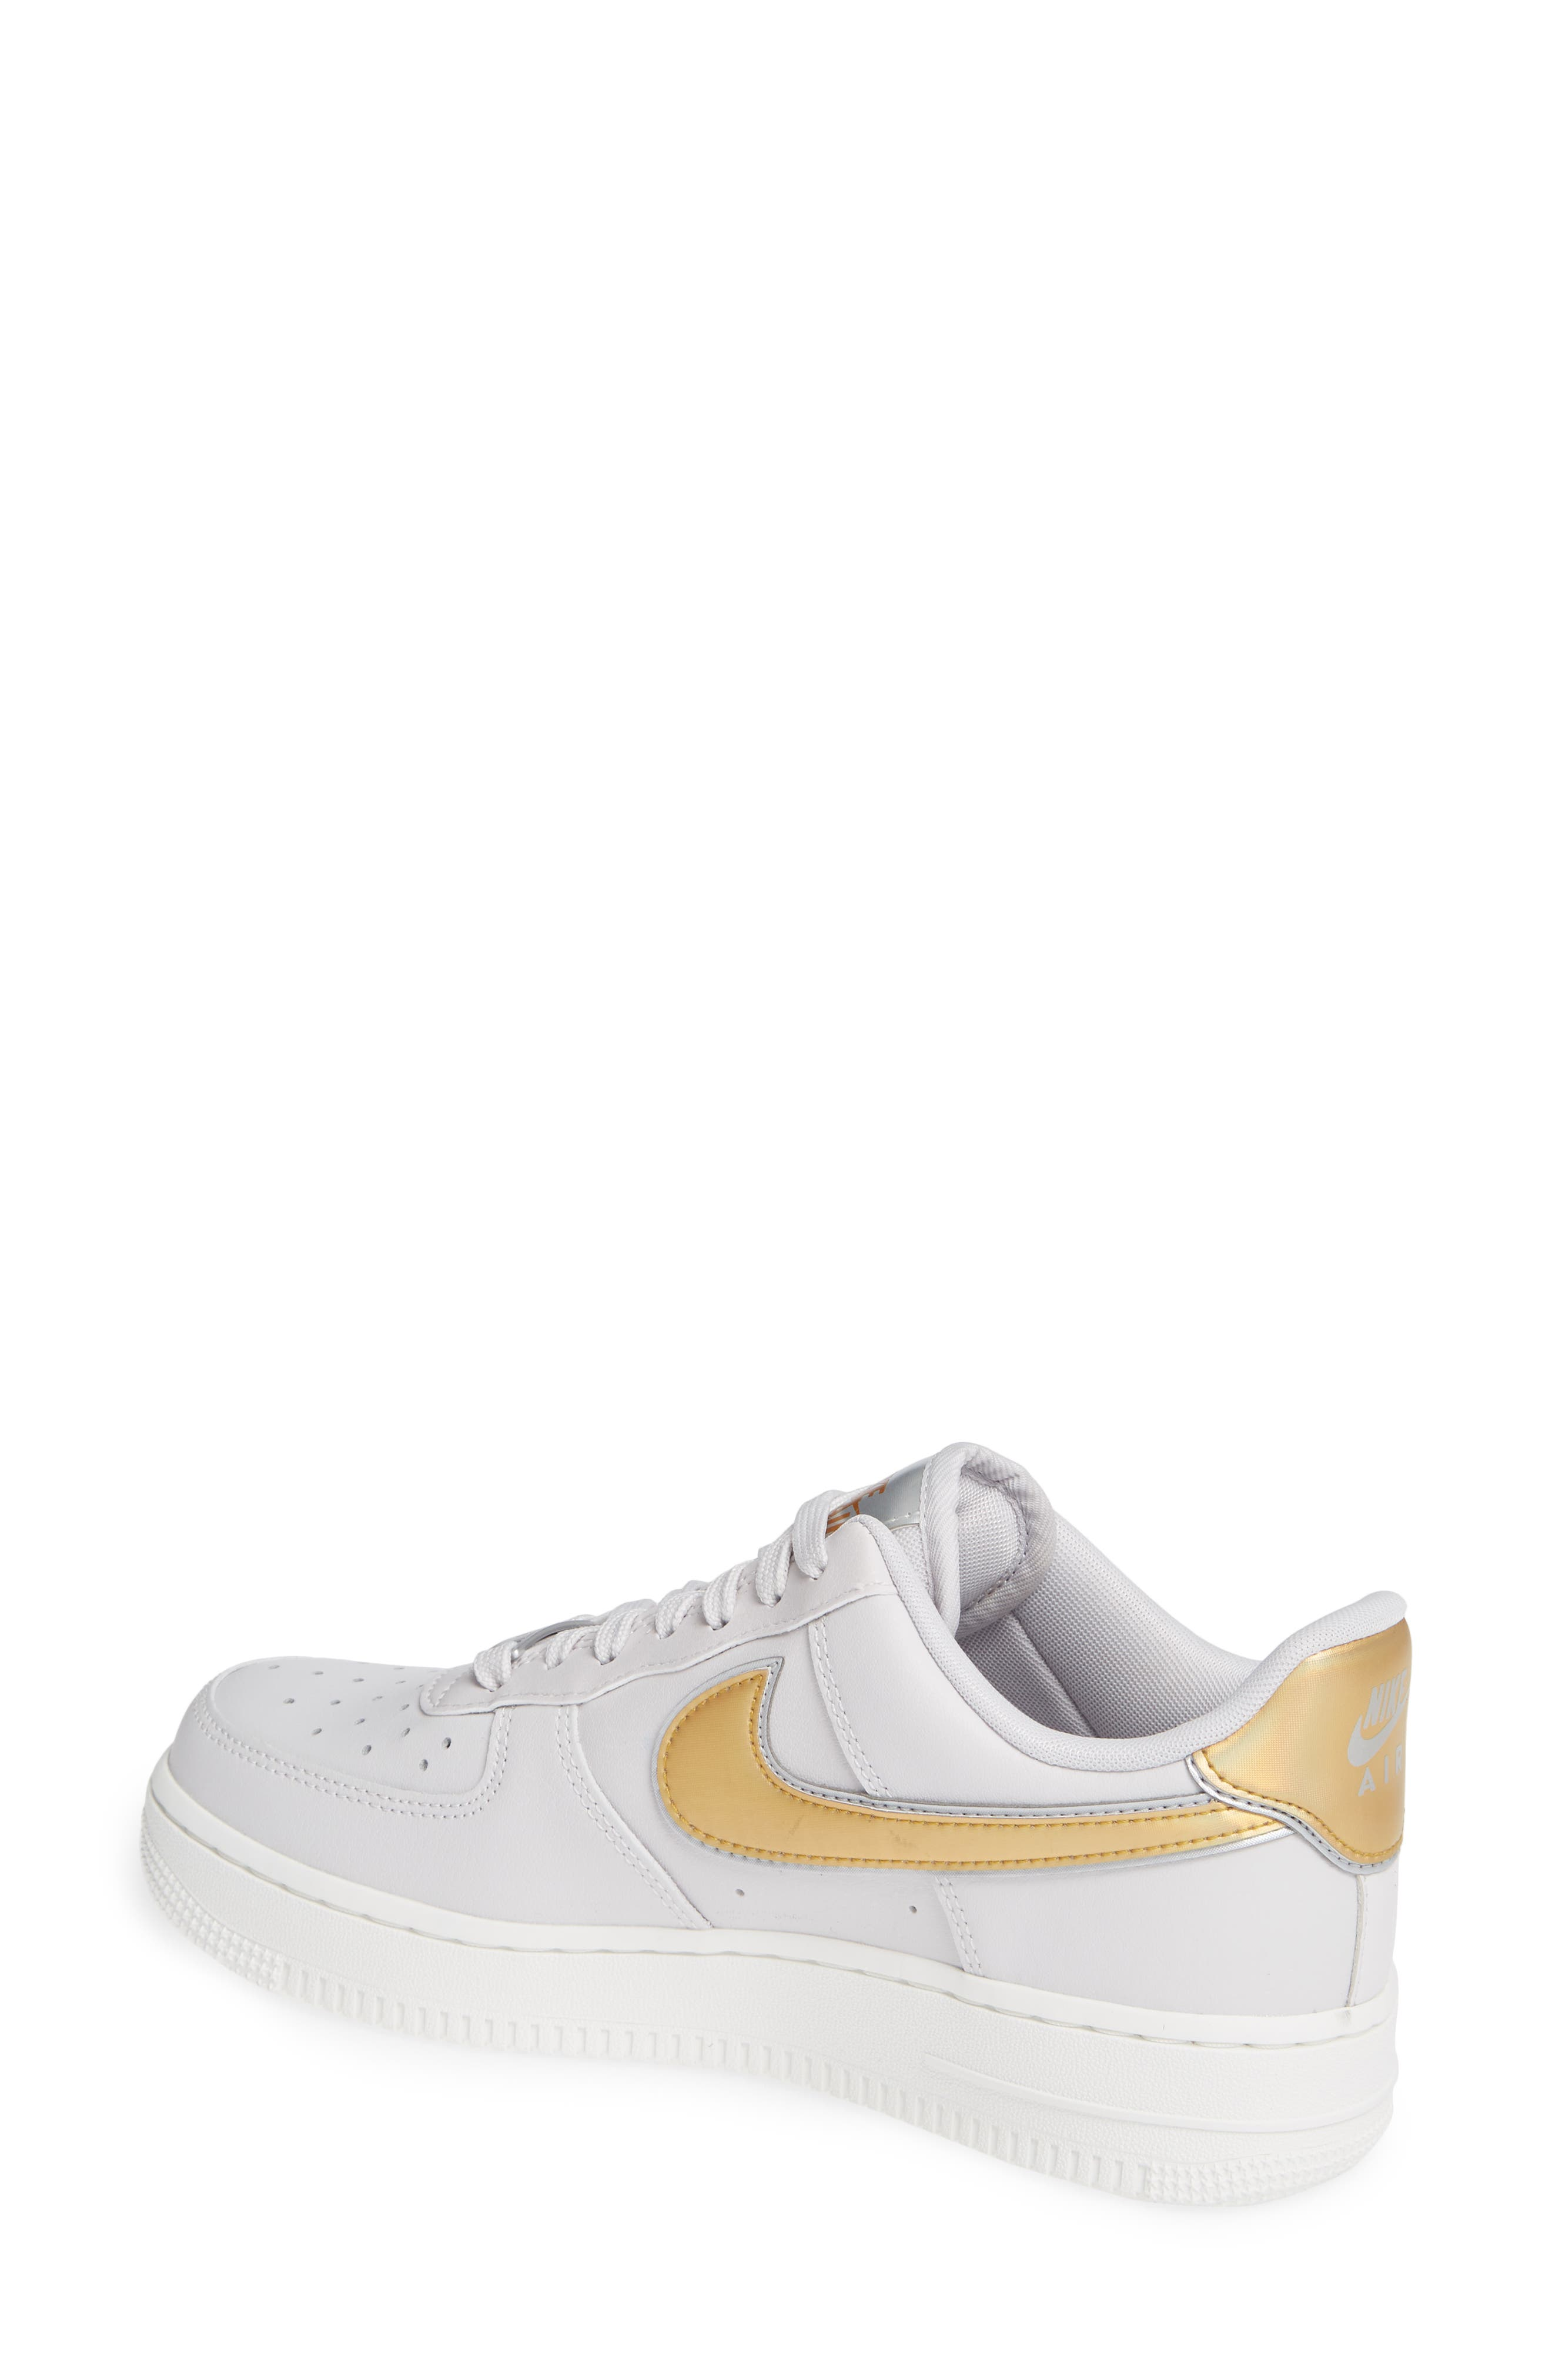 Air Force 1 '07 Premium Sneaker,                             Alternate thumbnail 2, color,                             GREY/ METALLIC GOLD- WHITE